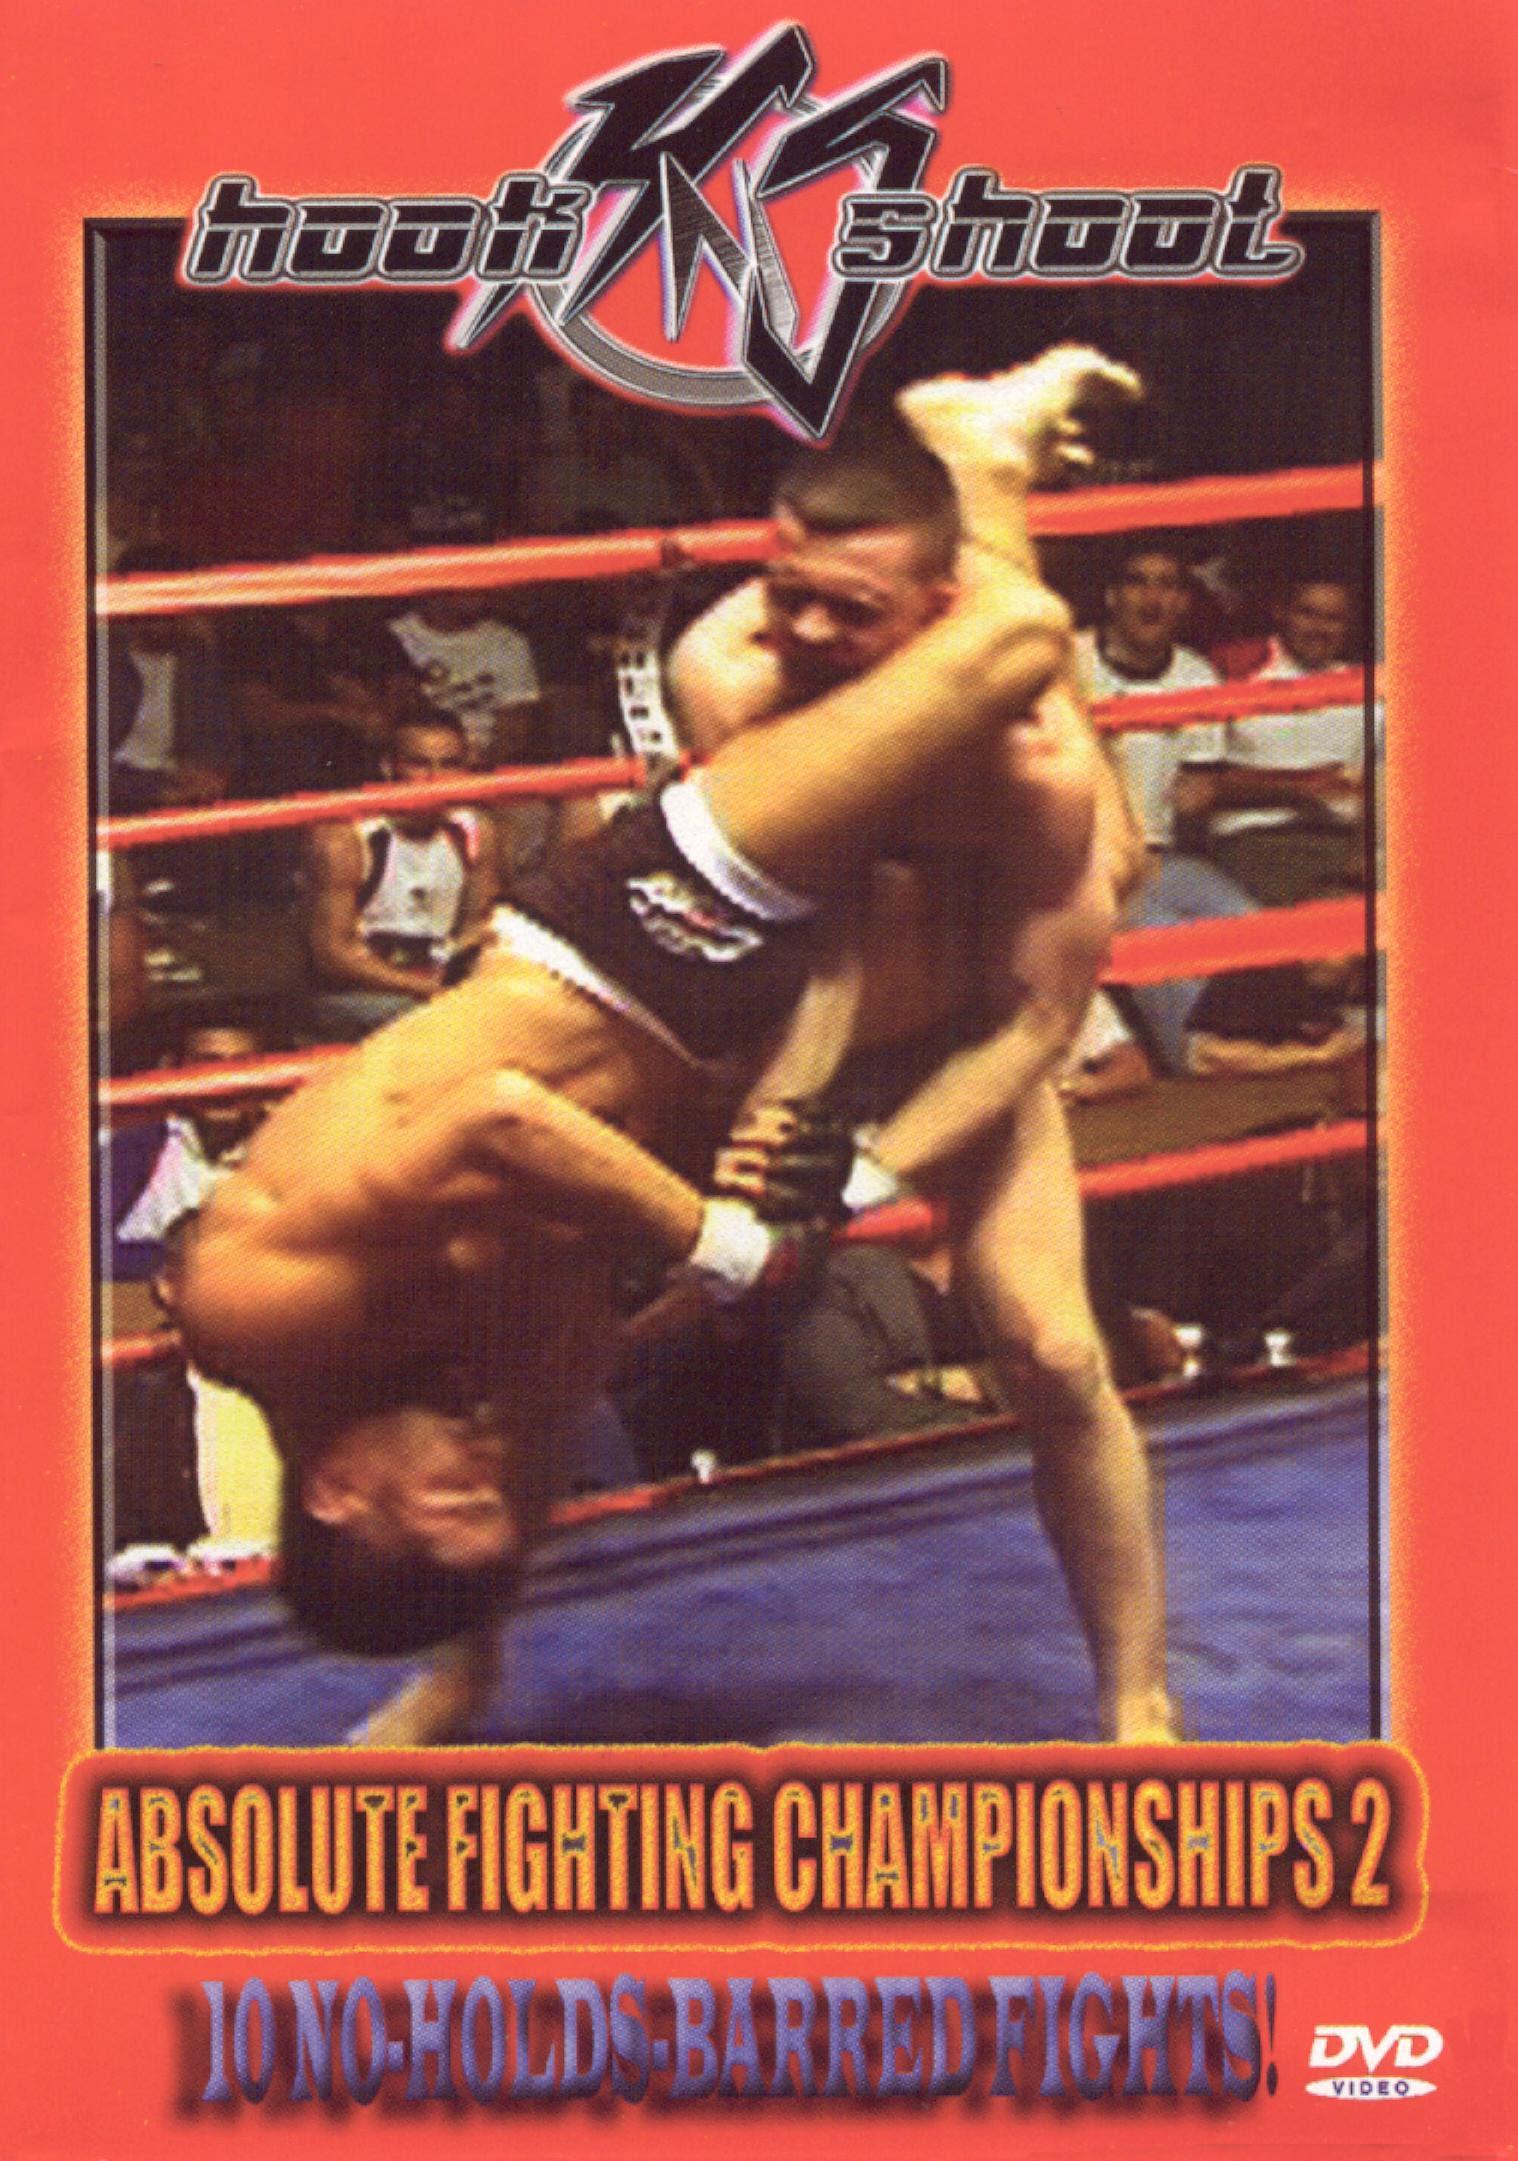 HooknShoot: Absolute Fighting Championships, Vol. 2